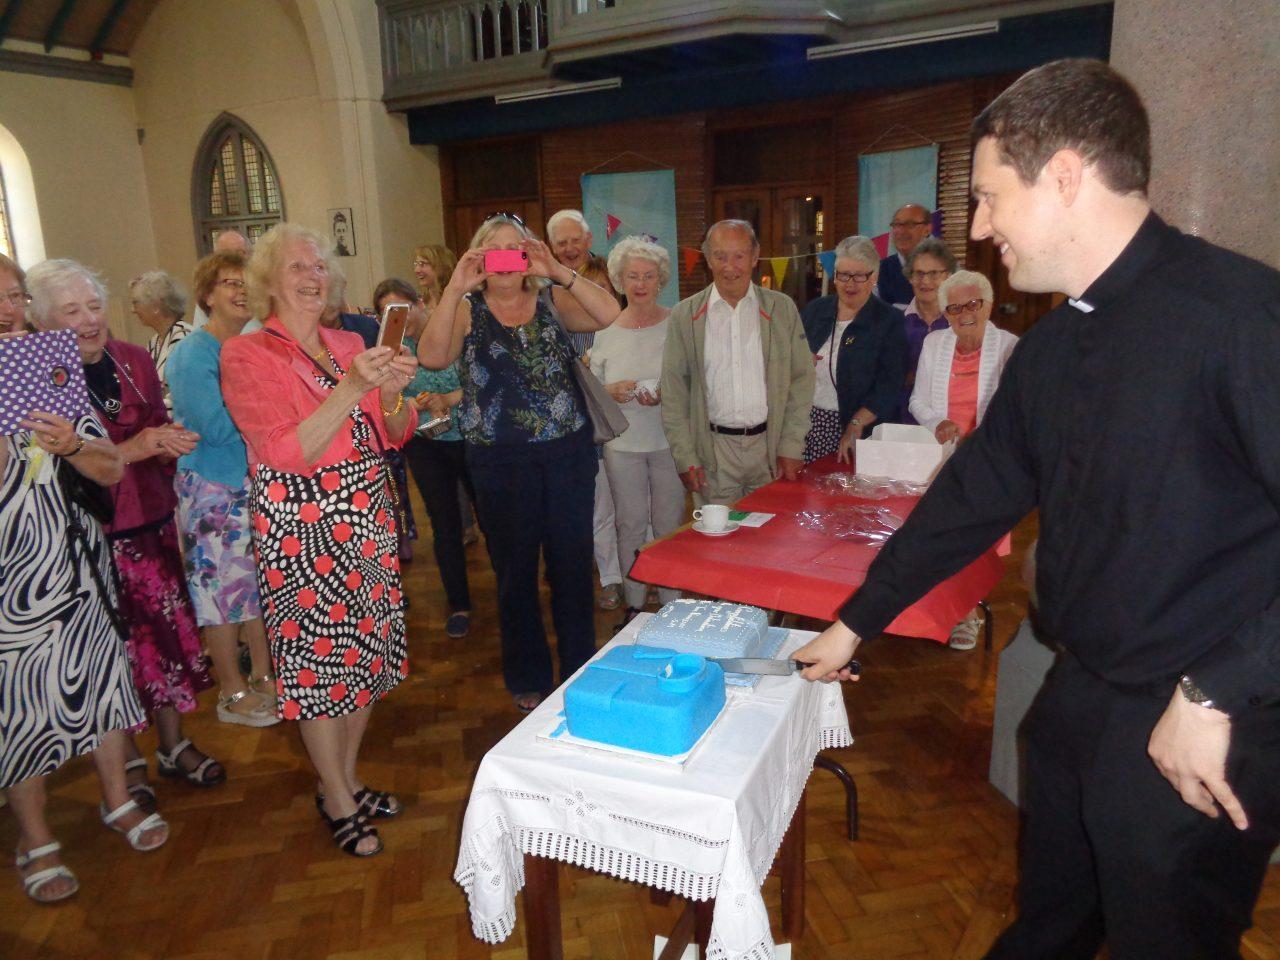 Fr. Tom Cuts His Cake